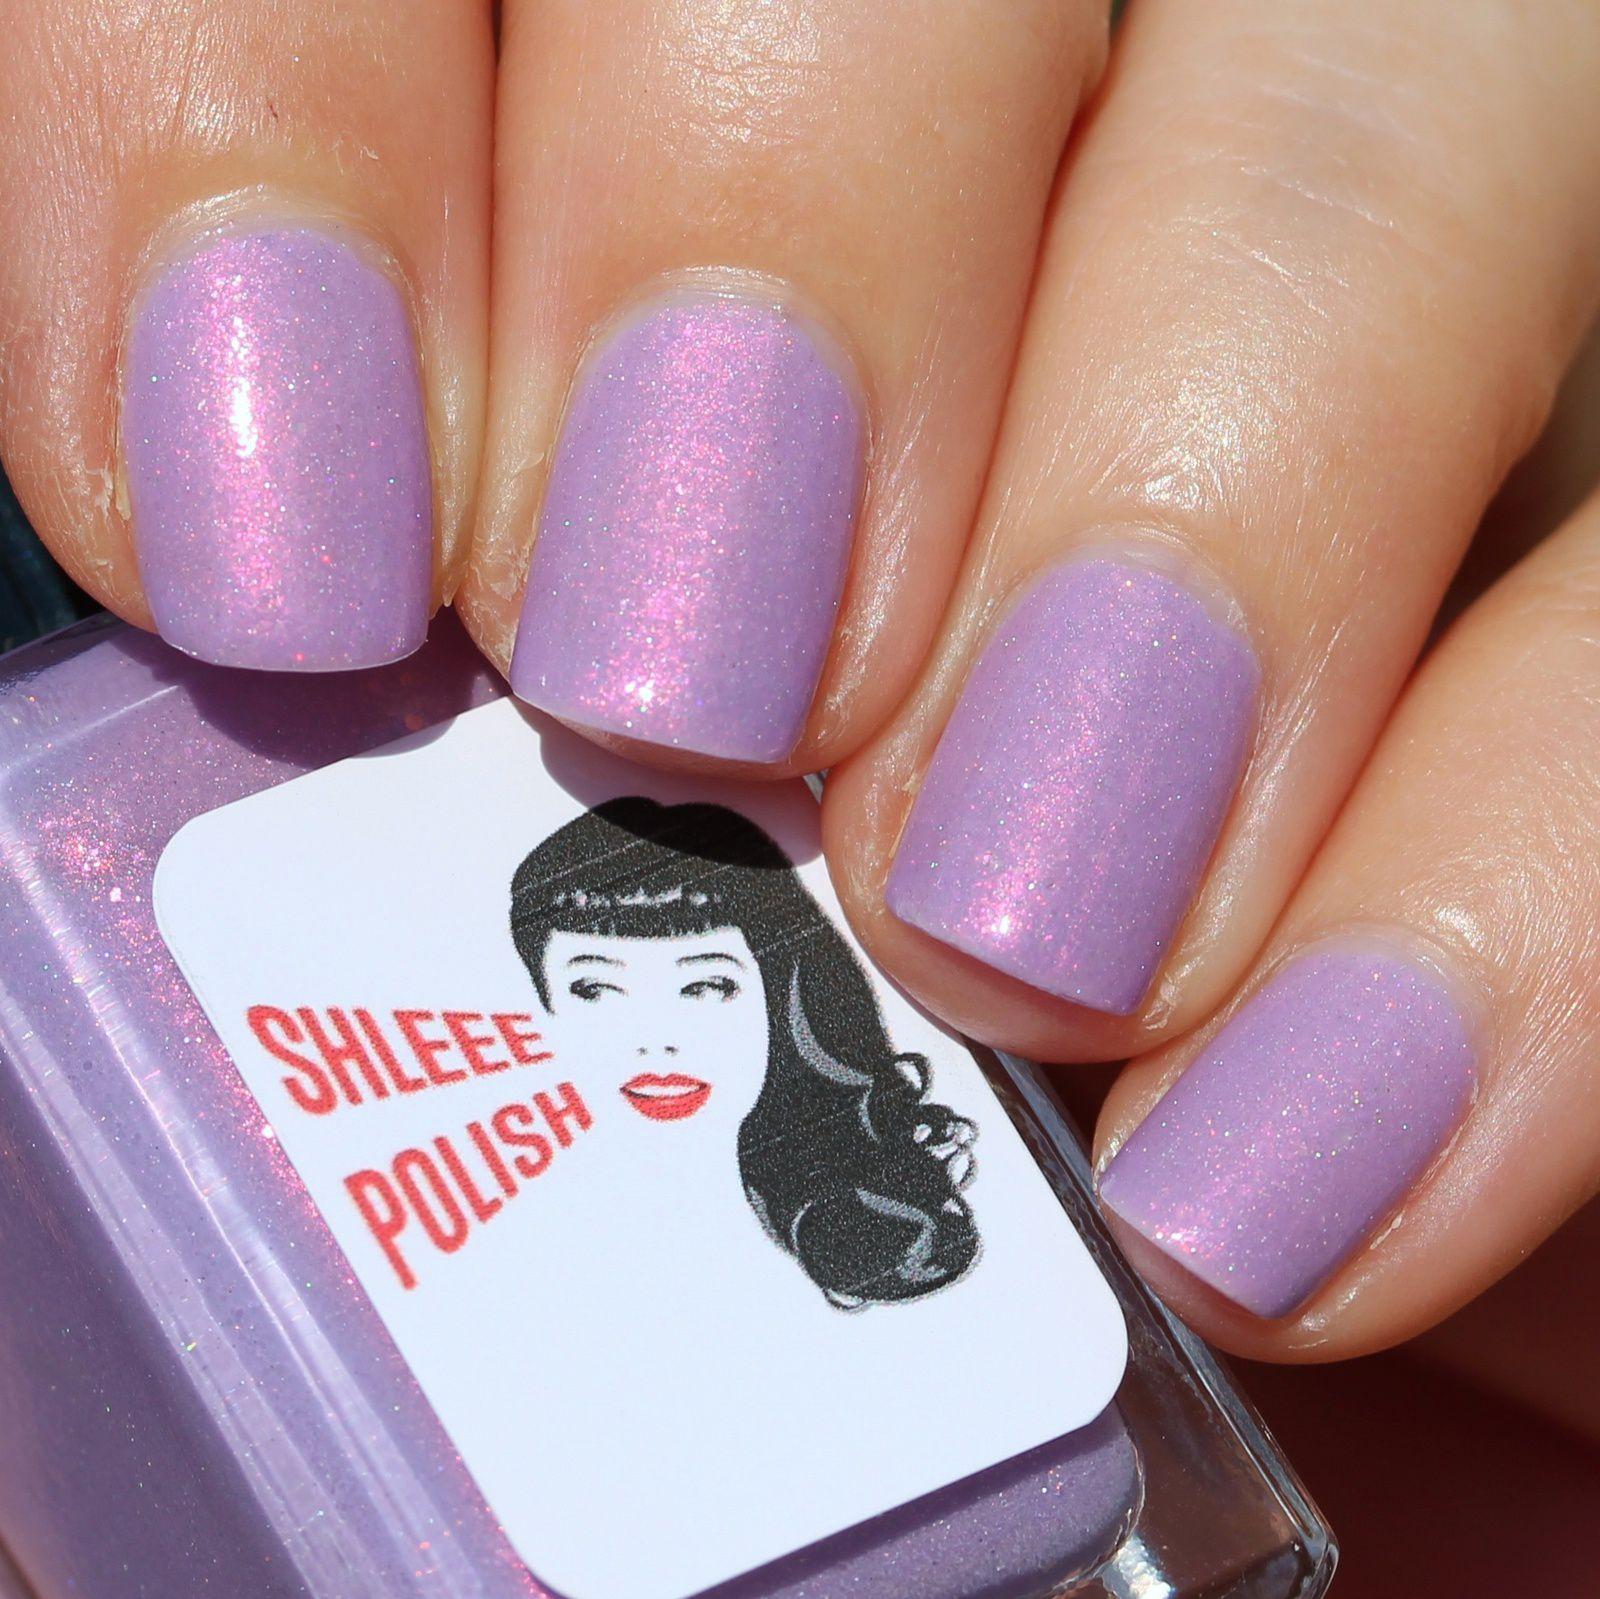 Sally Hansen Complete Care 4-in-1 Extra Moisturizing Nail Treatment / Mavala Nail Shield Phase I Nylon Fibers / Shleee Polish Wisteria / HK Girl Top Coat